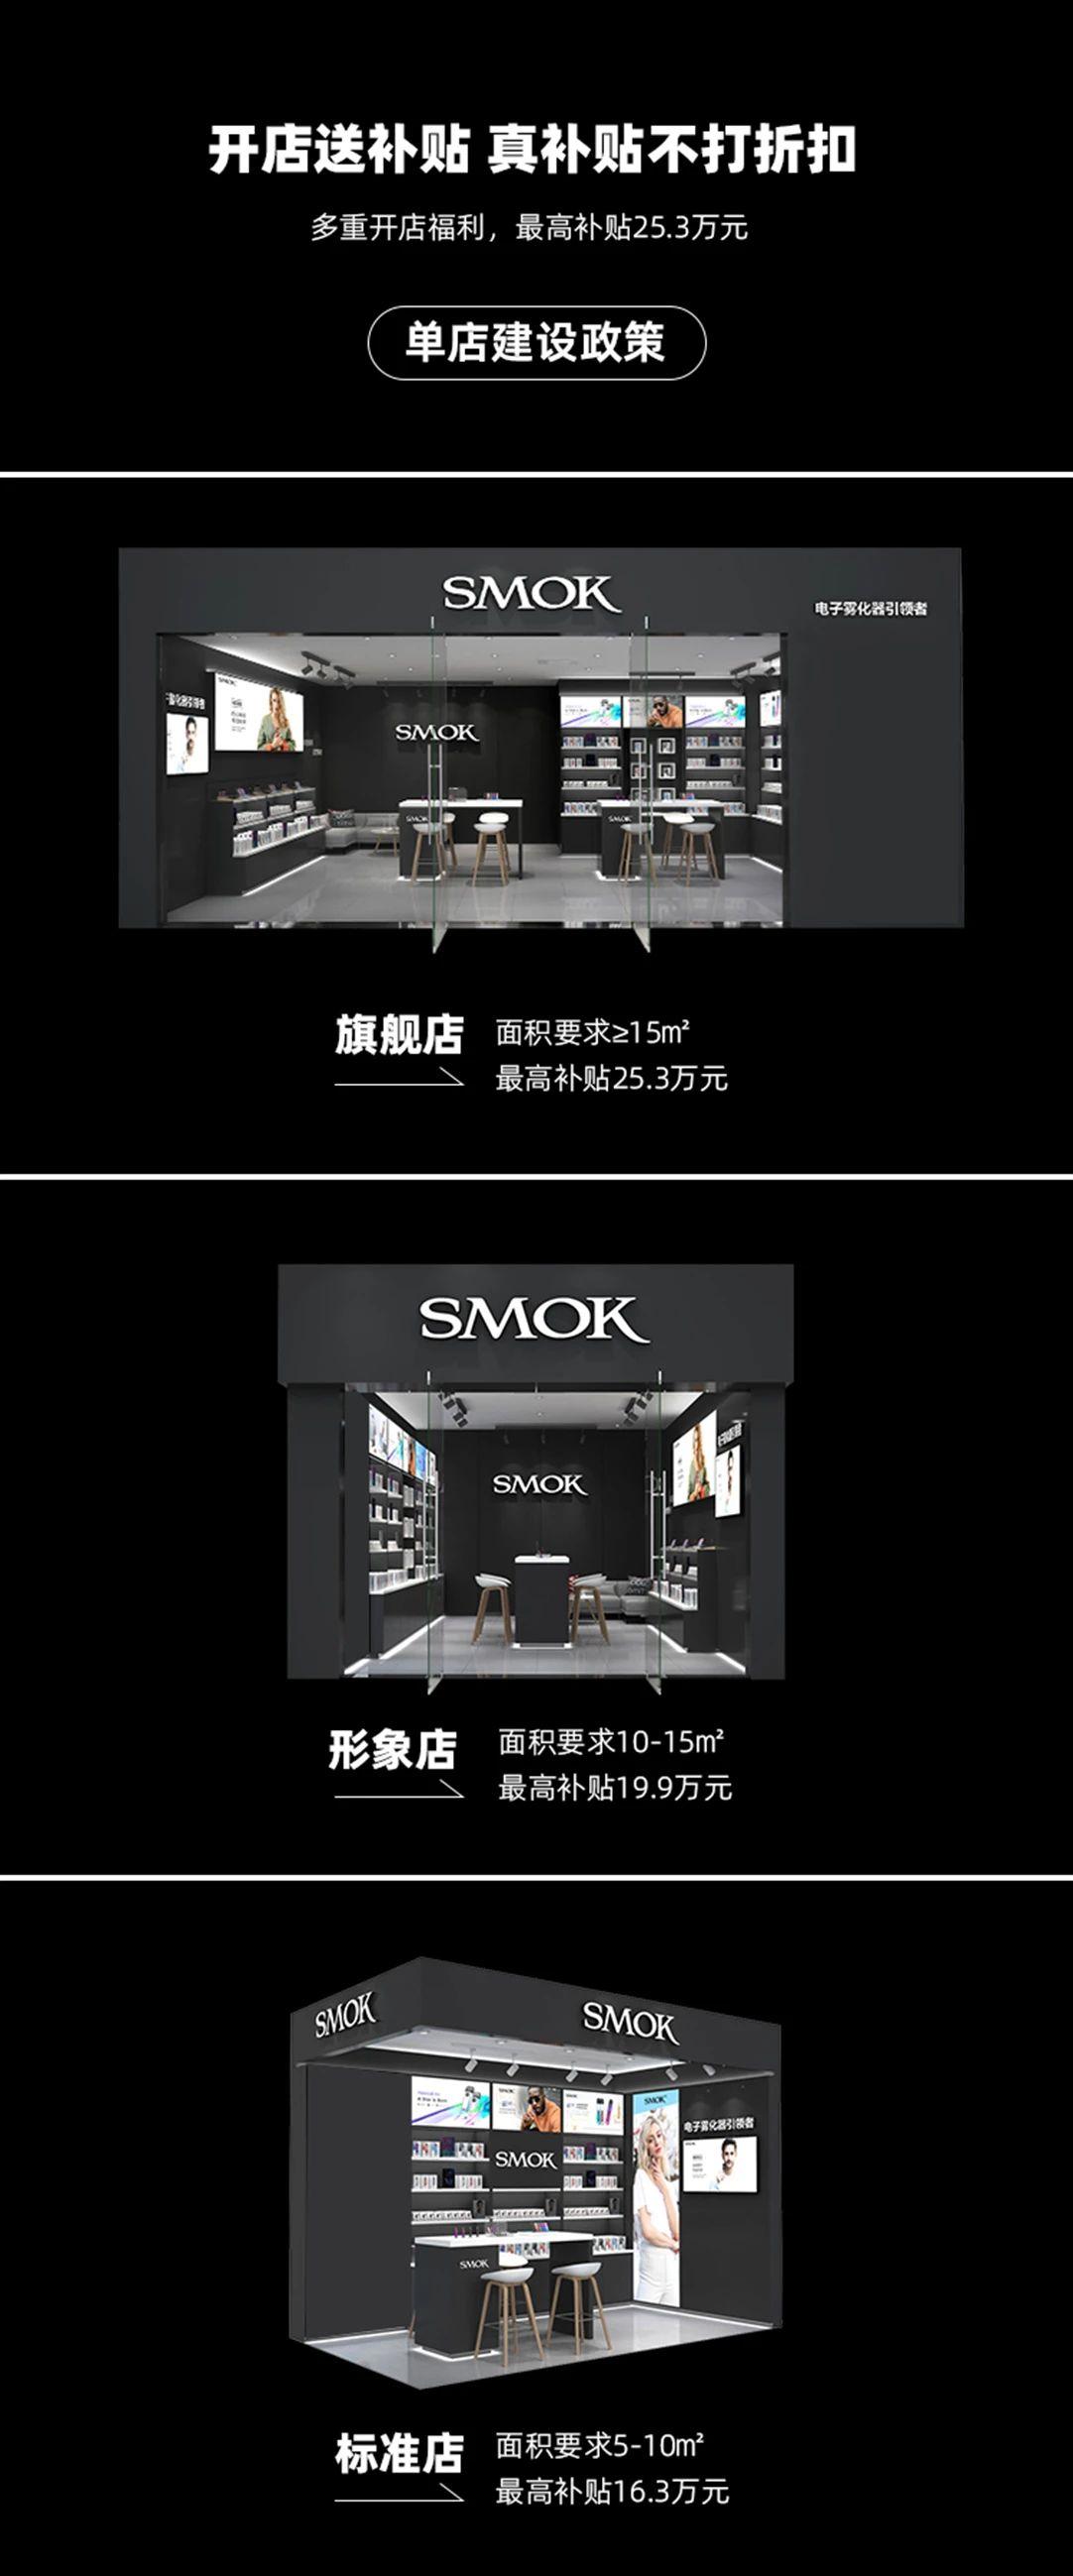 SMOK正式发布招商计划,最高补贴达25.3万